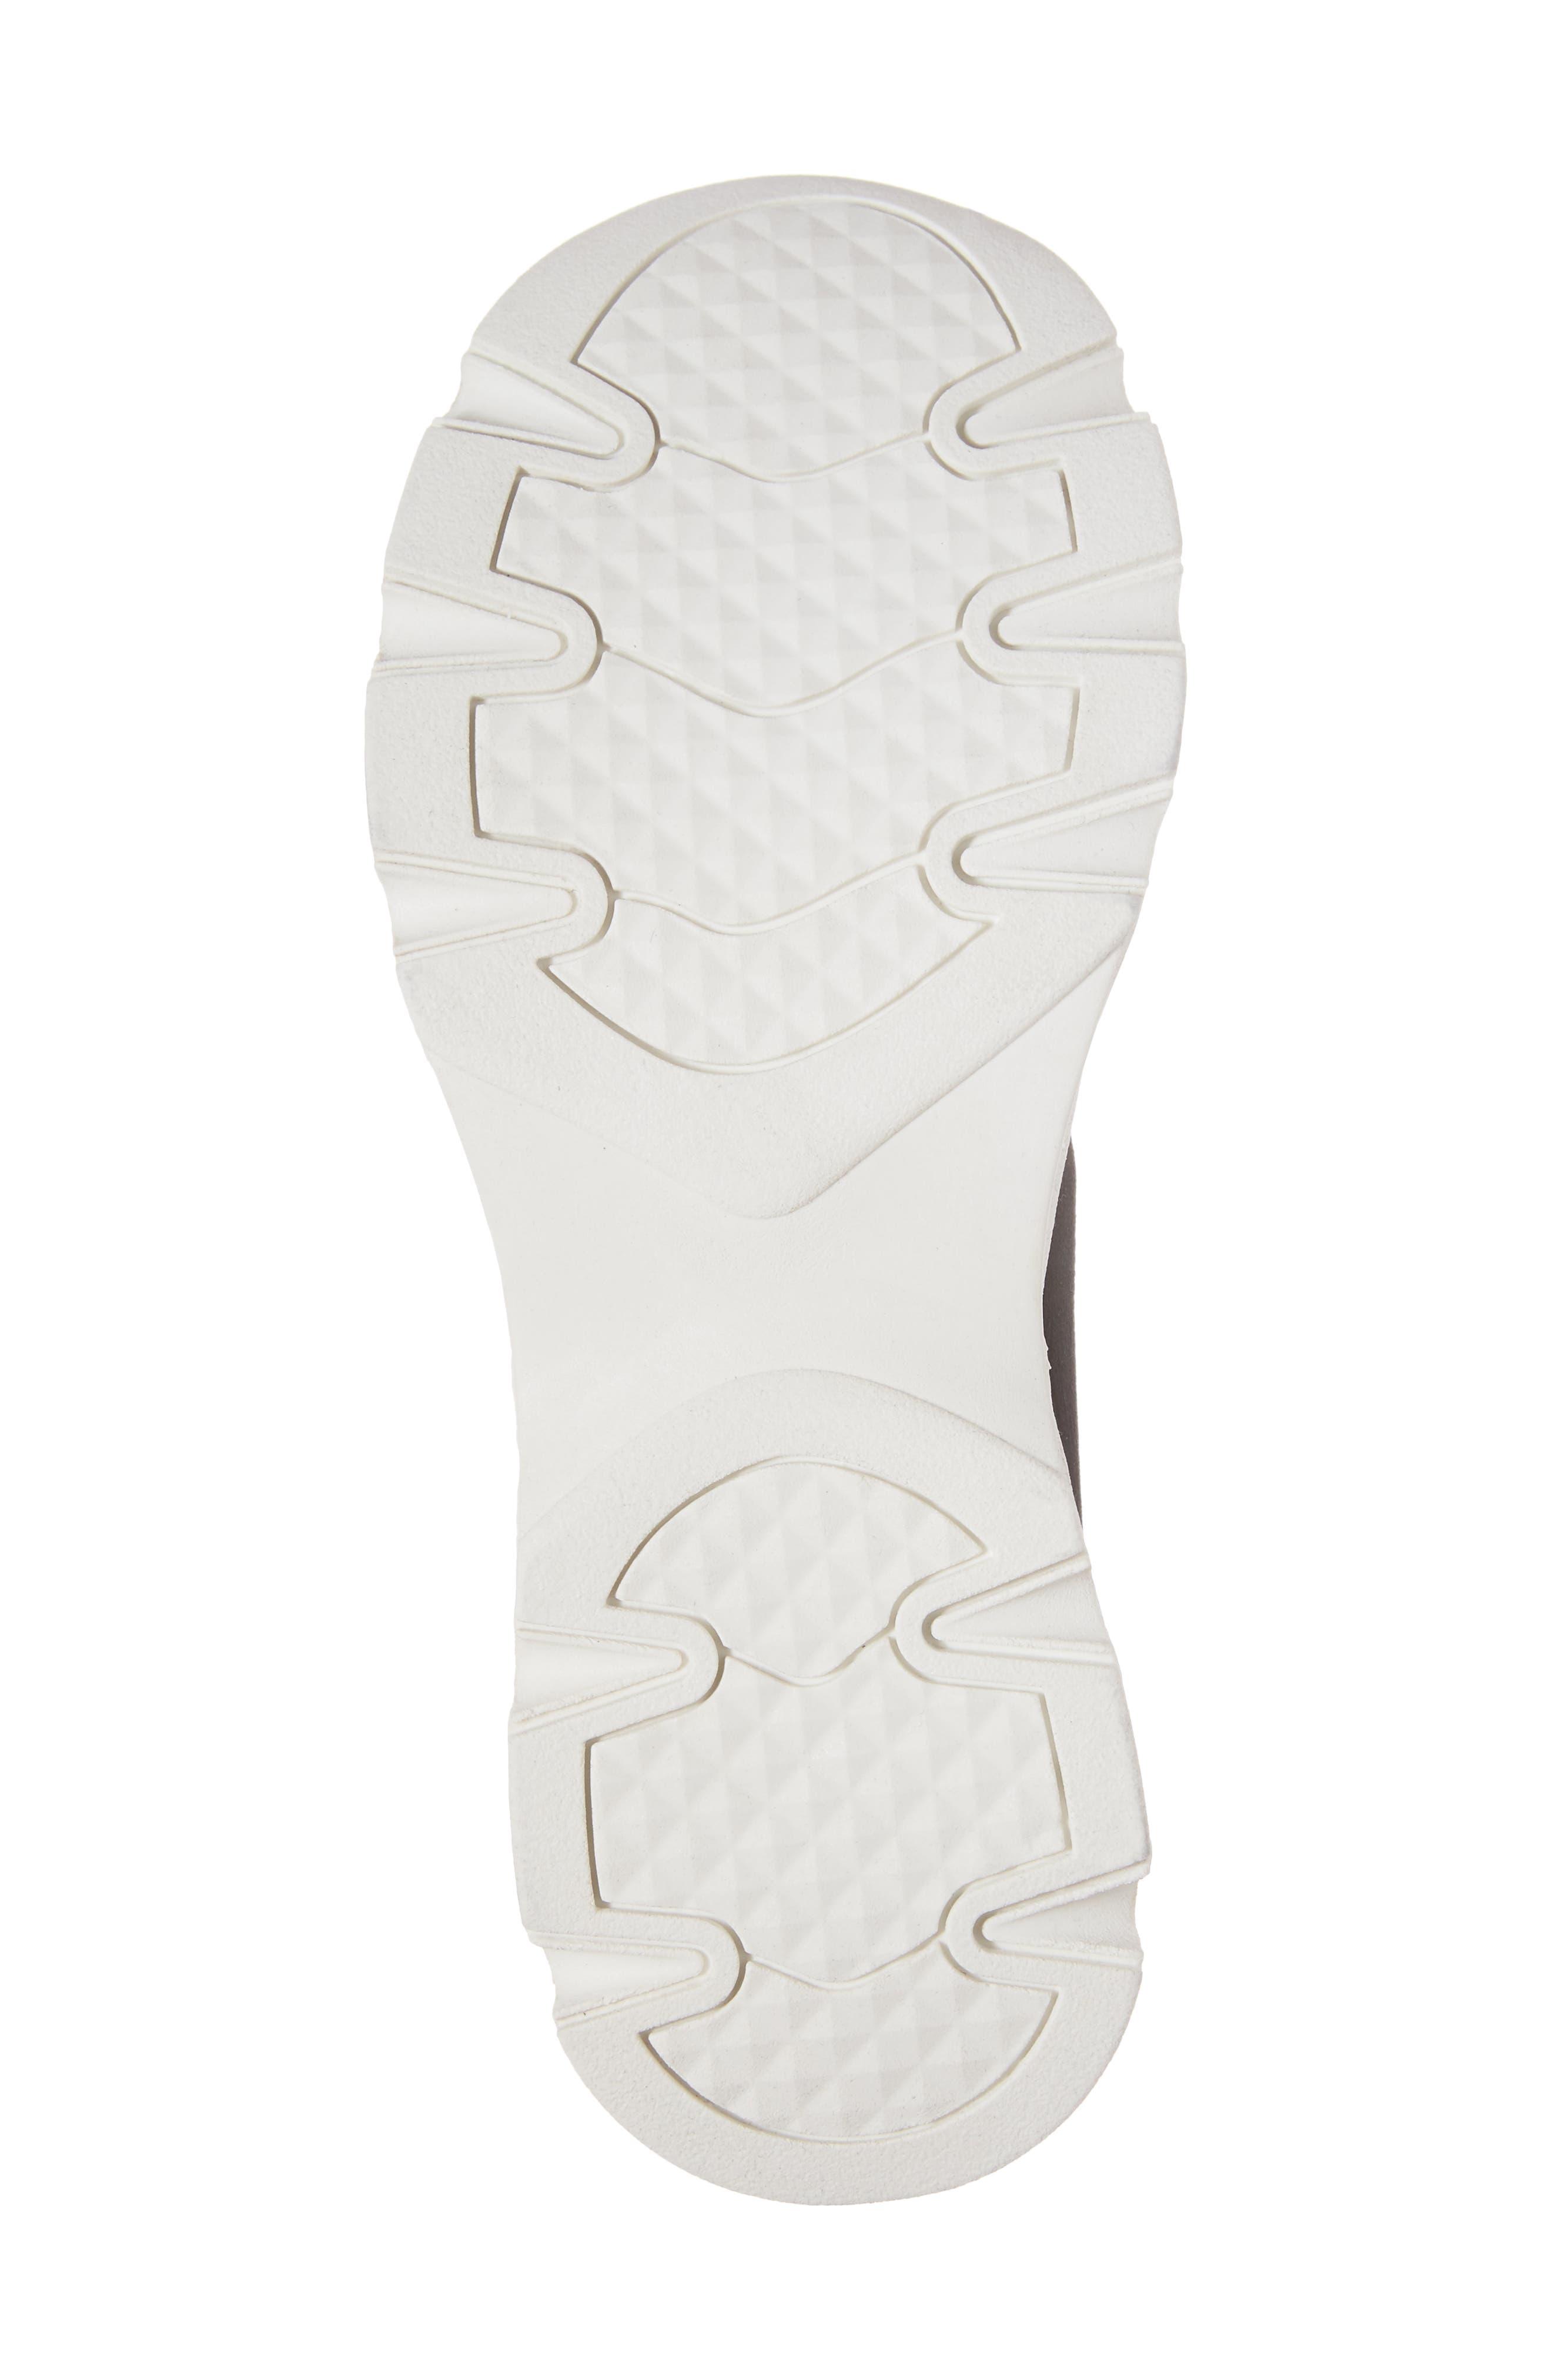 Winston Knit High Top Sneaker,                             Alternate thumbnail 6, color,                             001